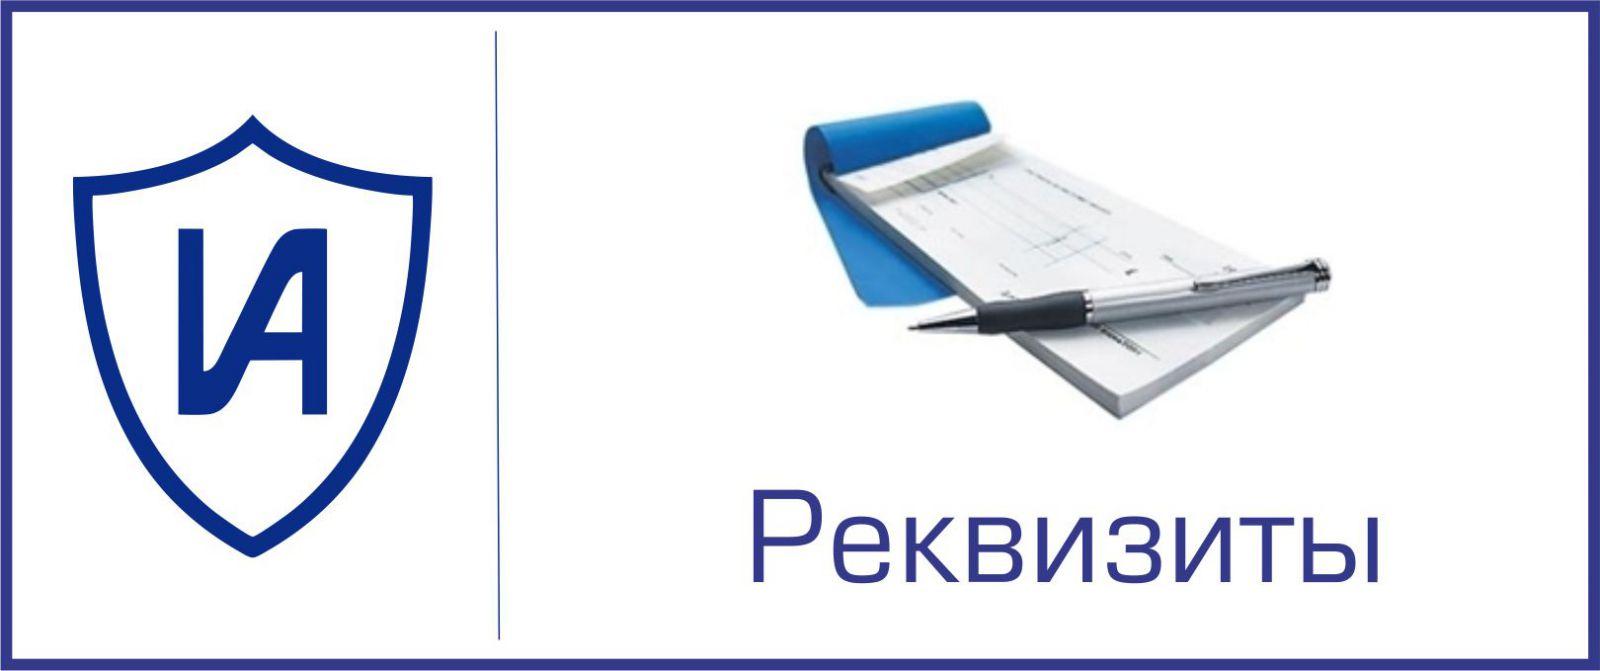 Реквизиты компании Мебель Дагестана